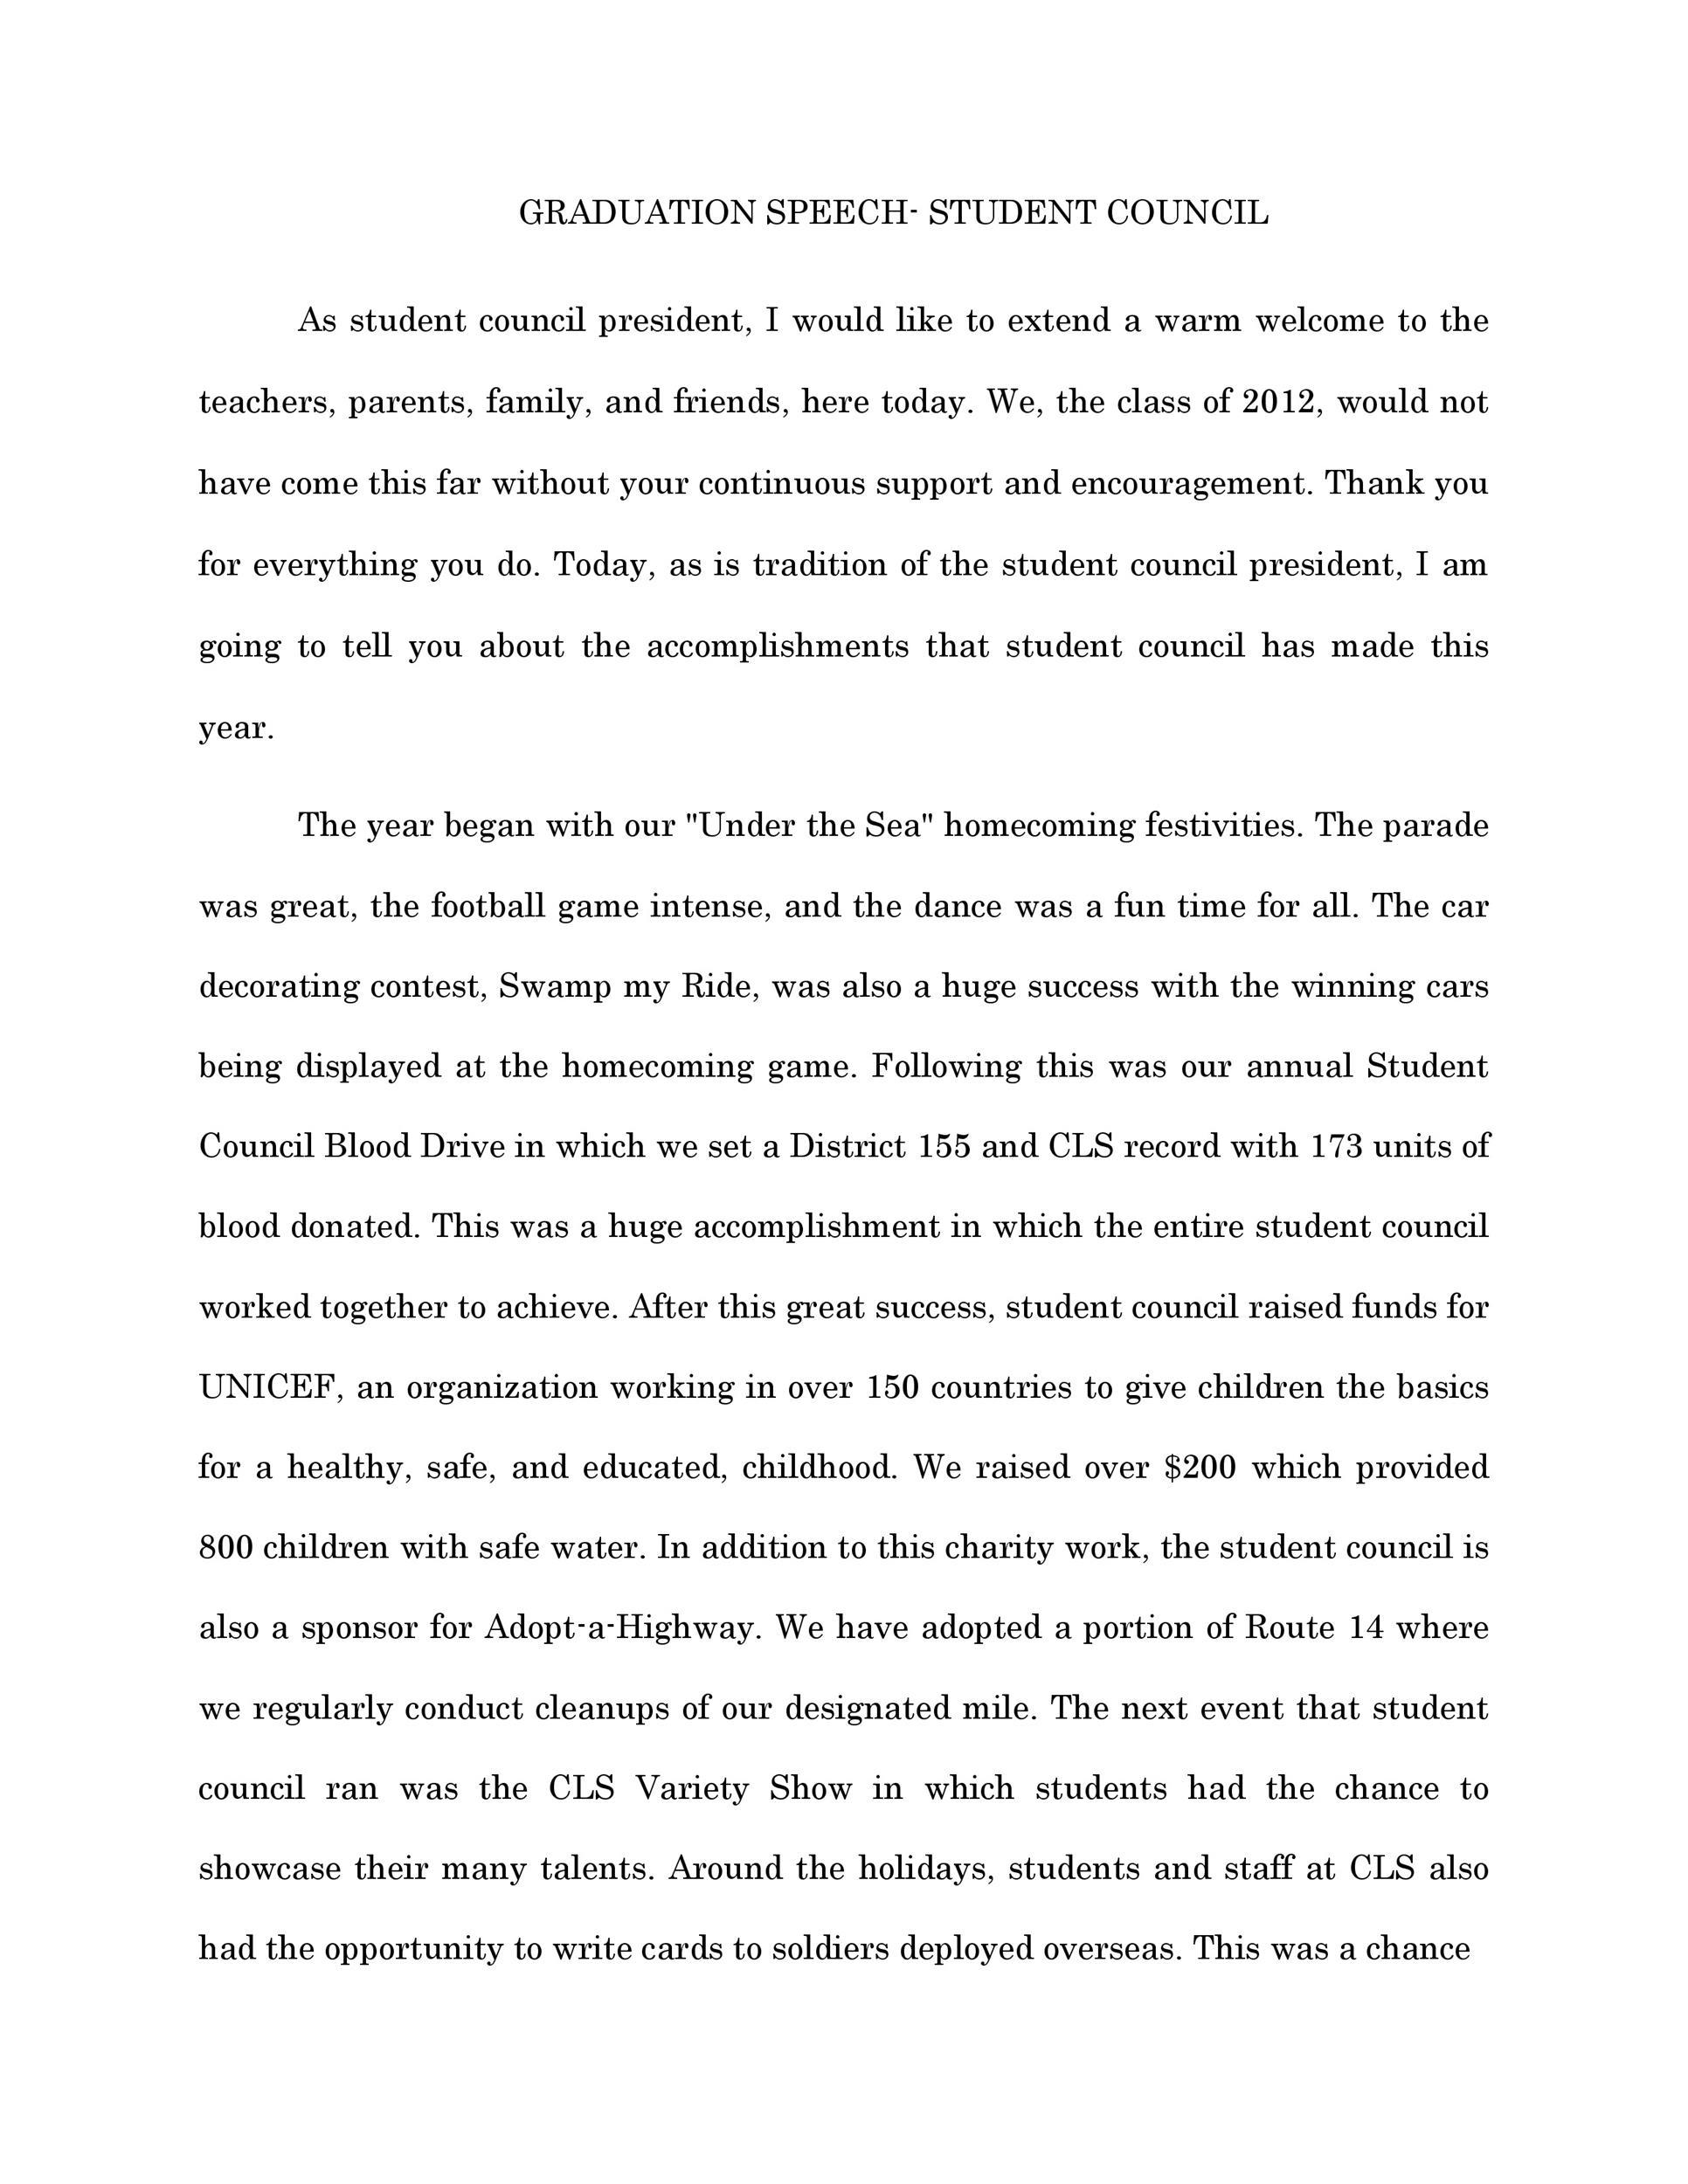 Free graduation speech example 46